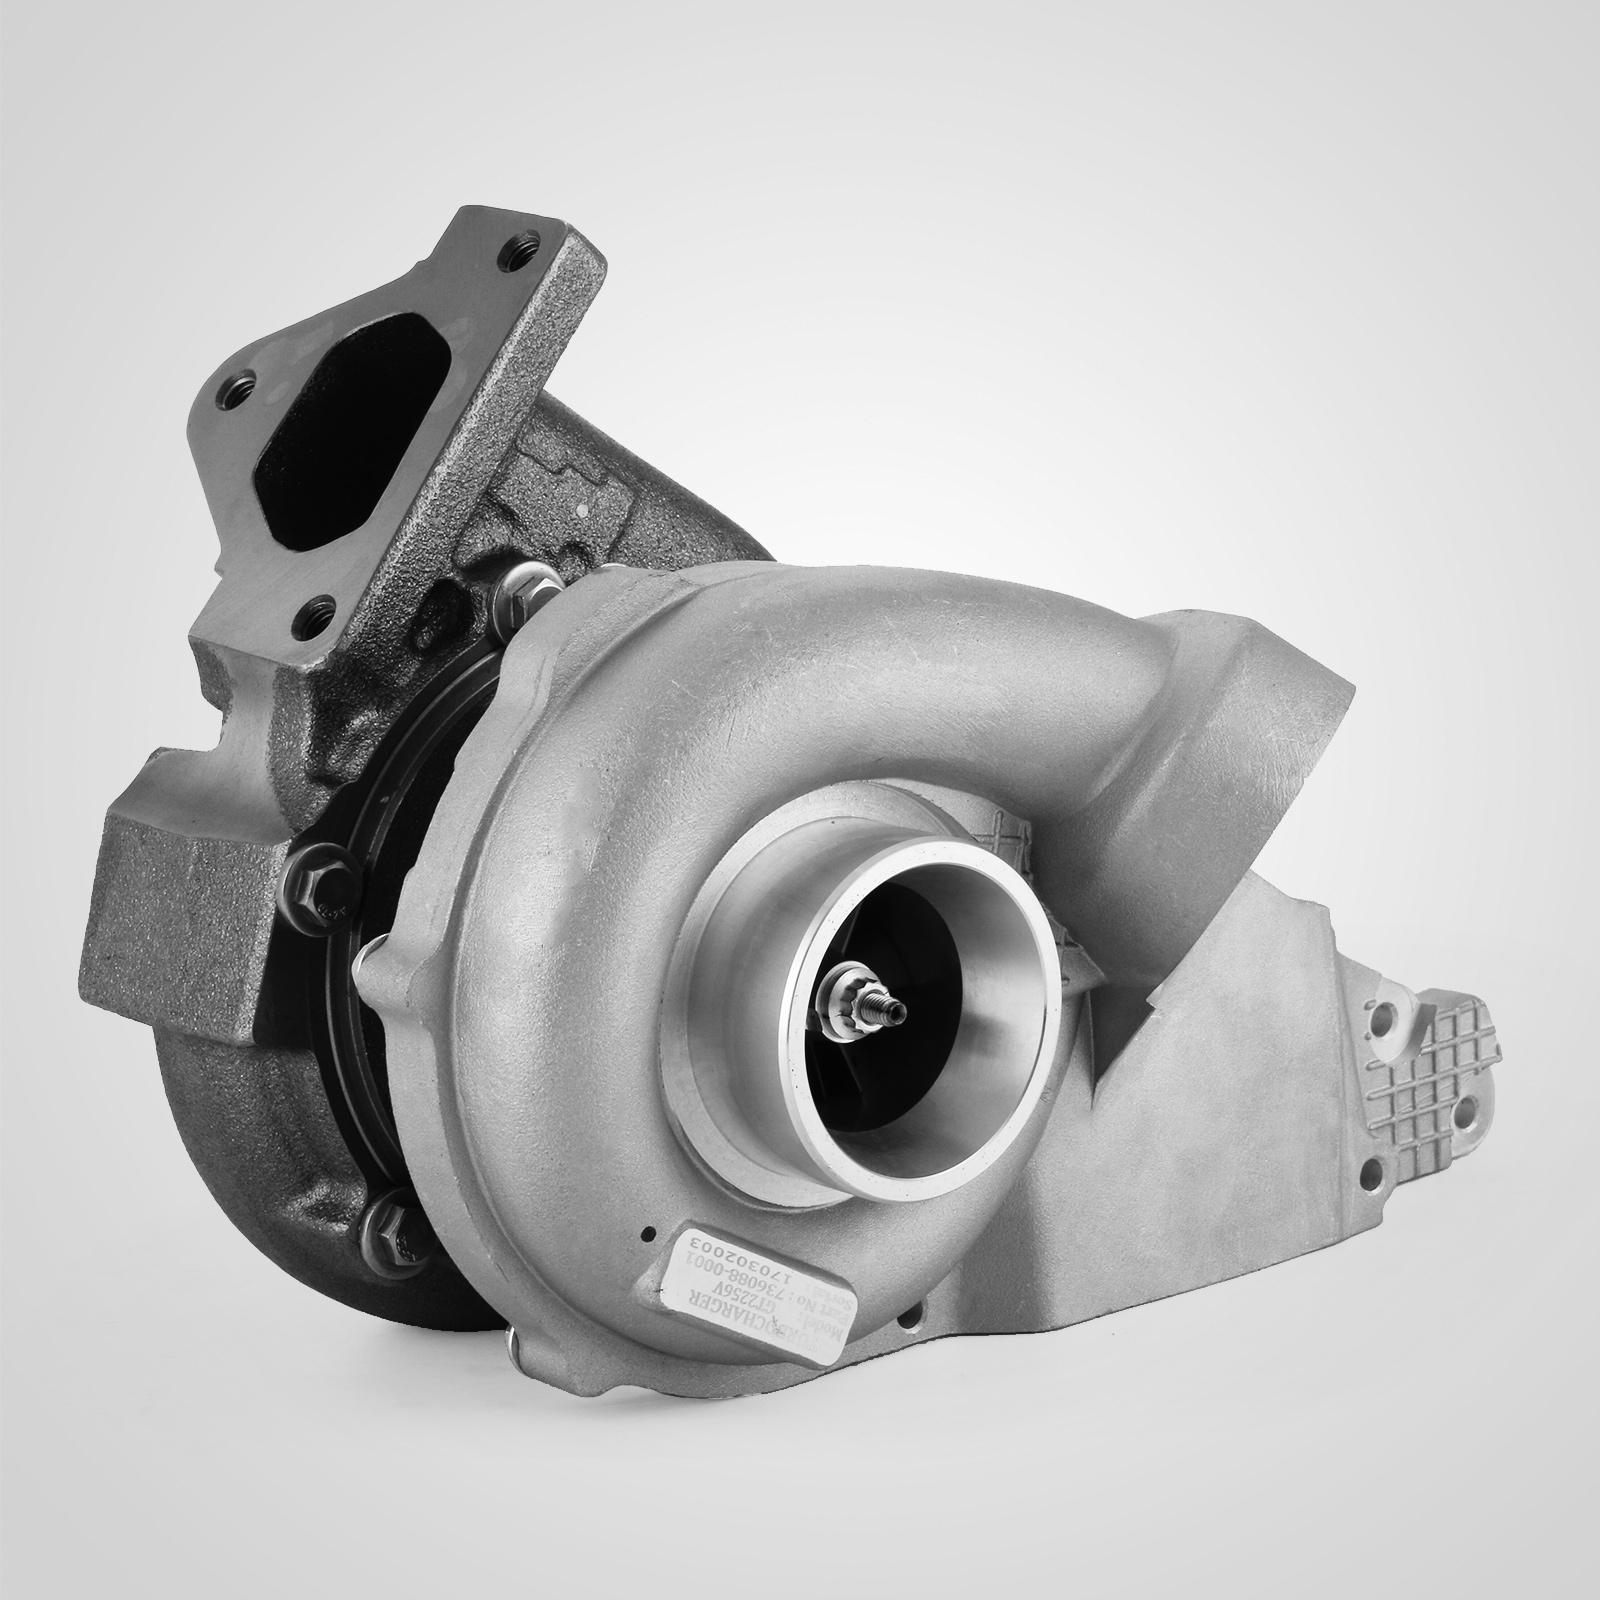 2012 Mercedes Benz Sprinter 2500 Crew Camshaft: For 04-07 Dodge Mercedes-Benz Sprinter 2.7L Diesel 736088